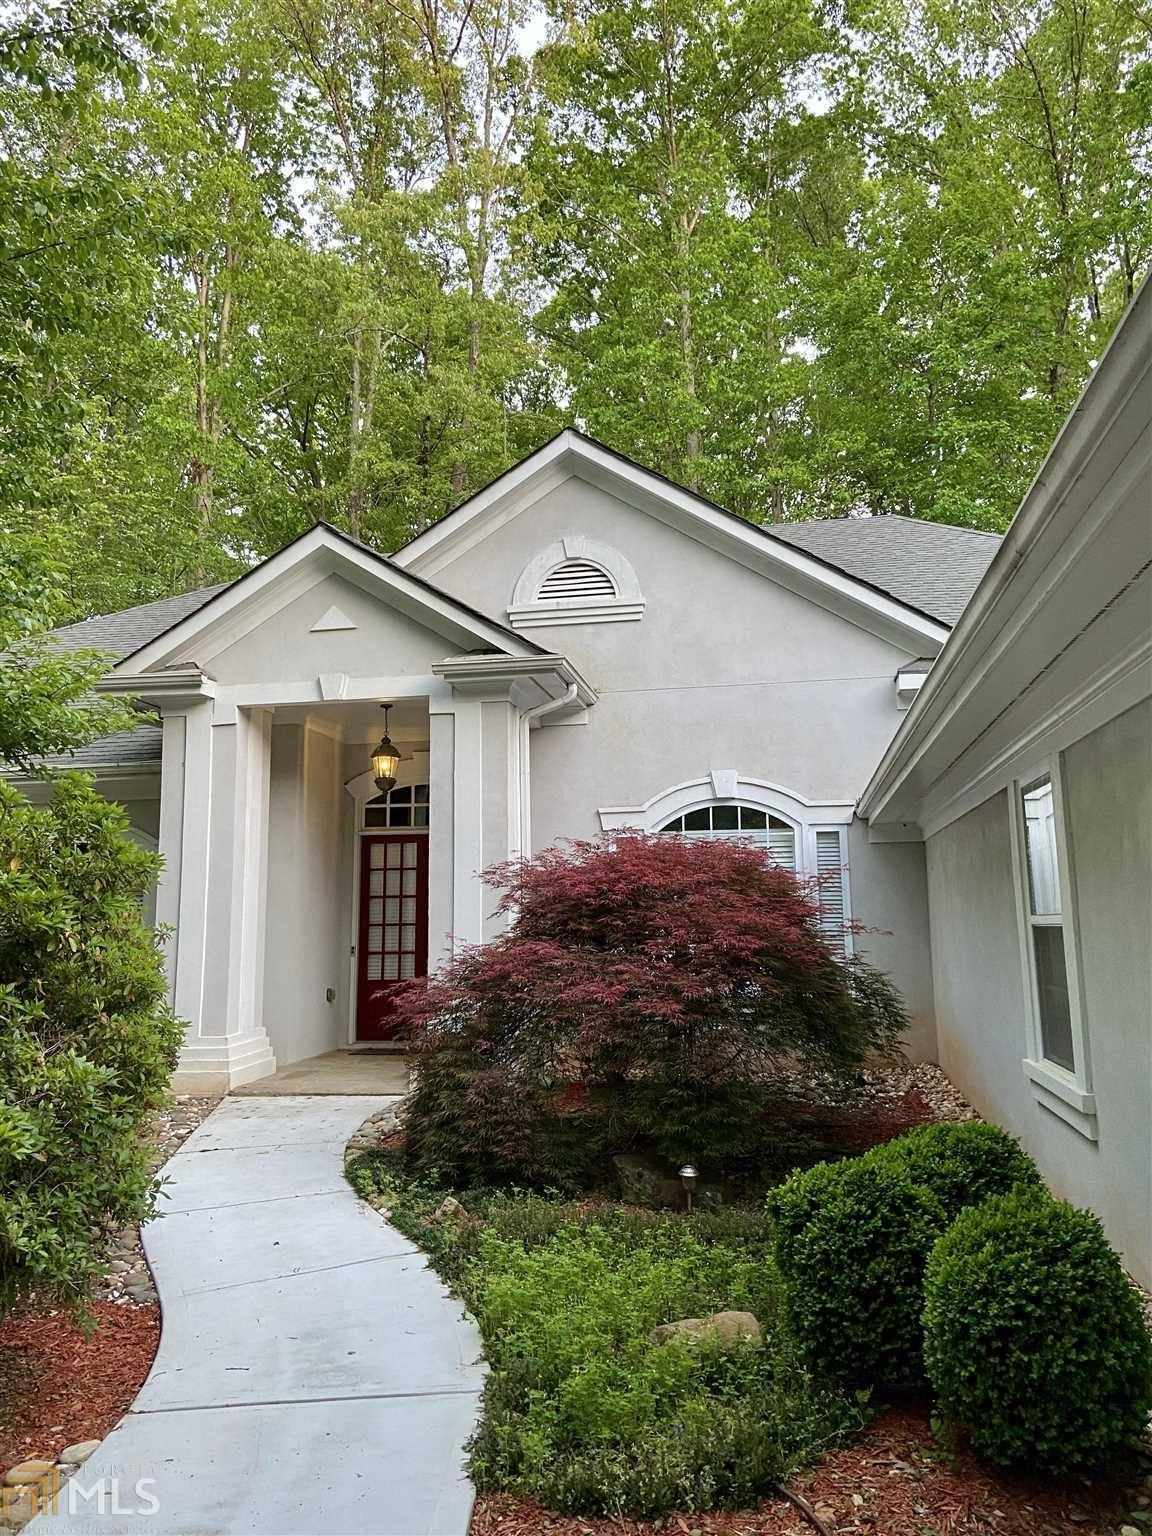 135 Adams Park Dr, Fayetteville, GA 30214 - MLS#: 8823462